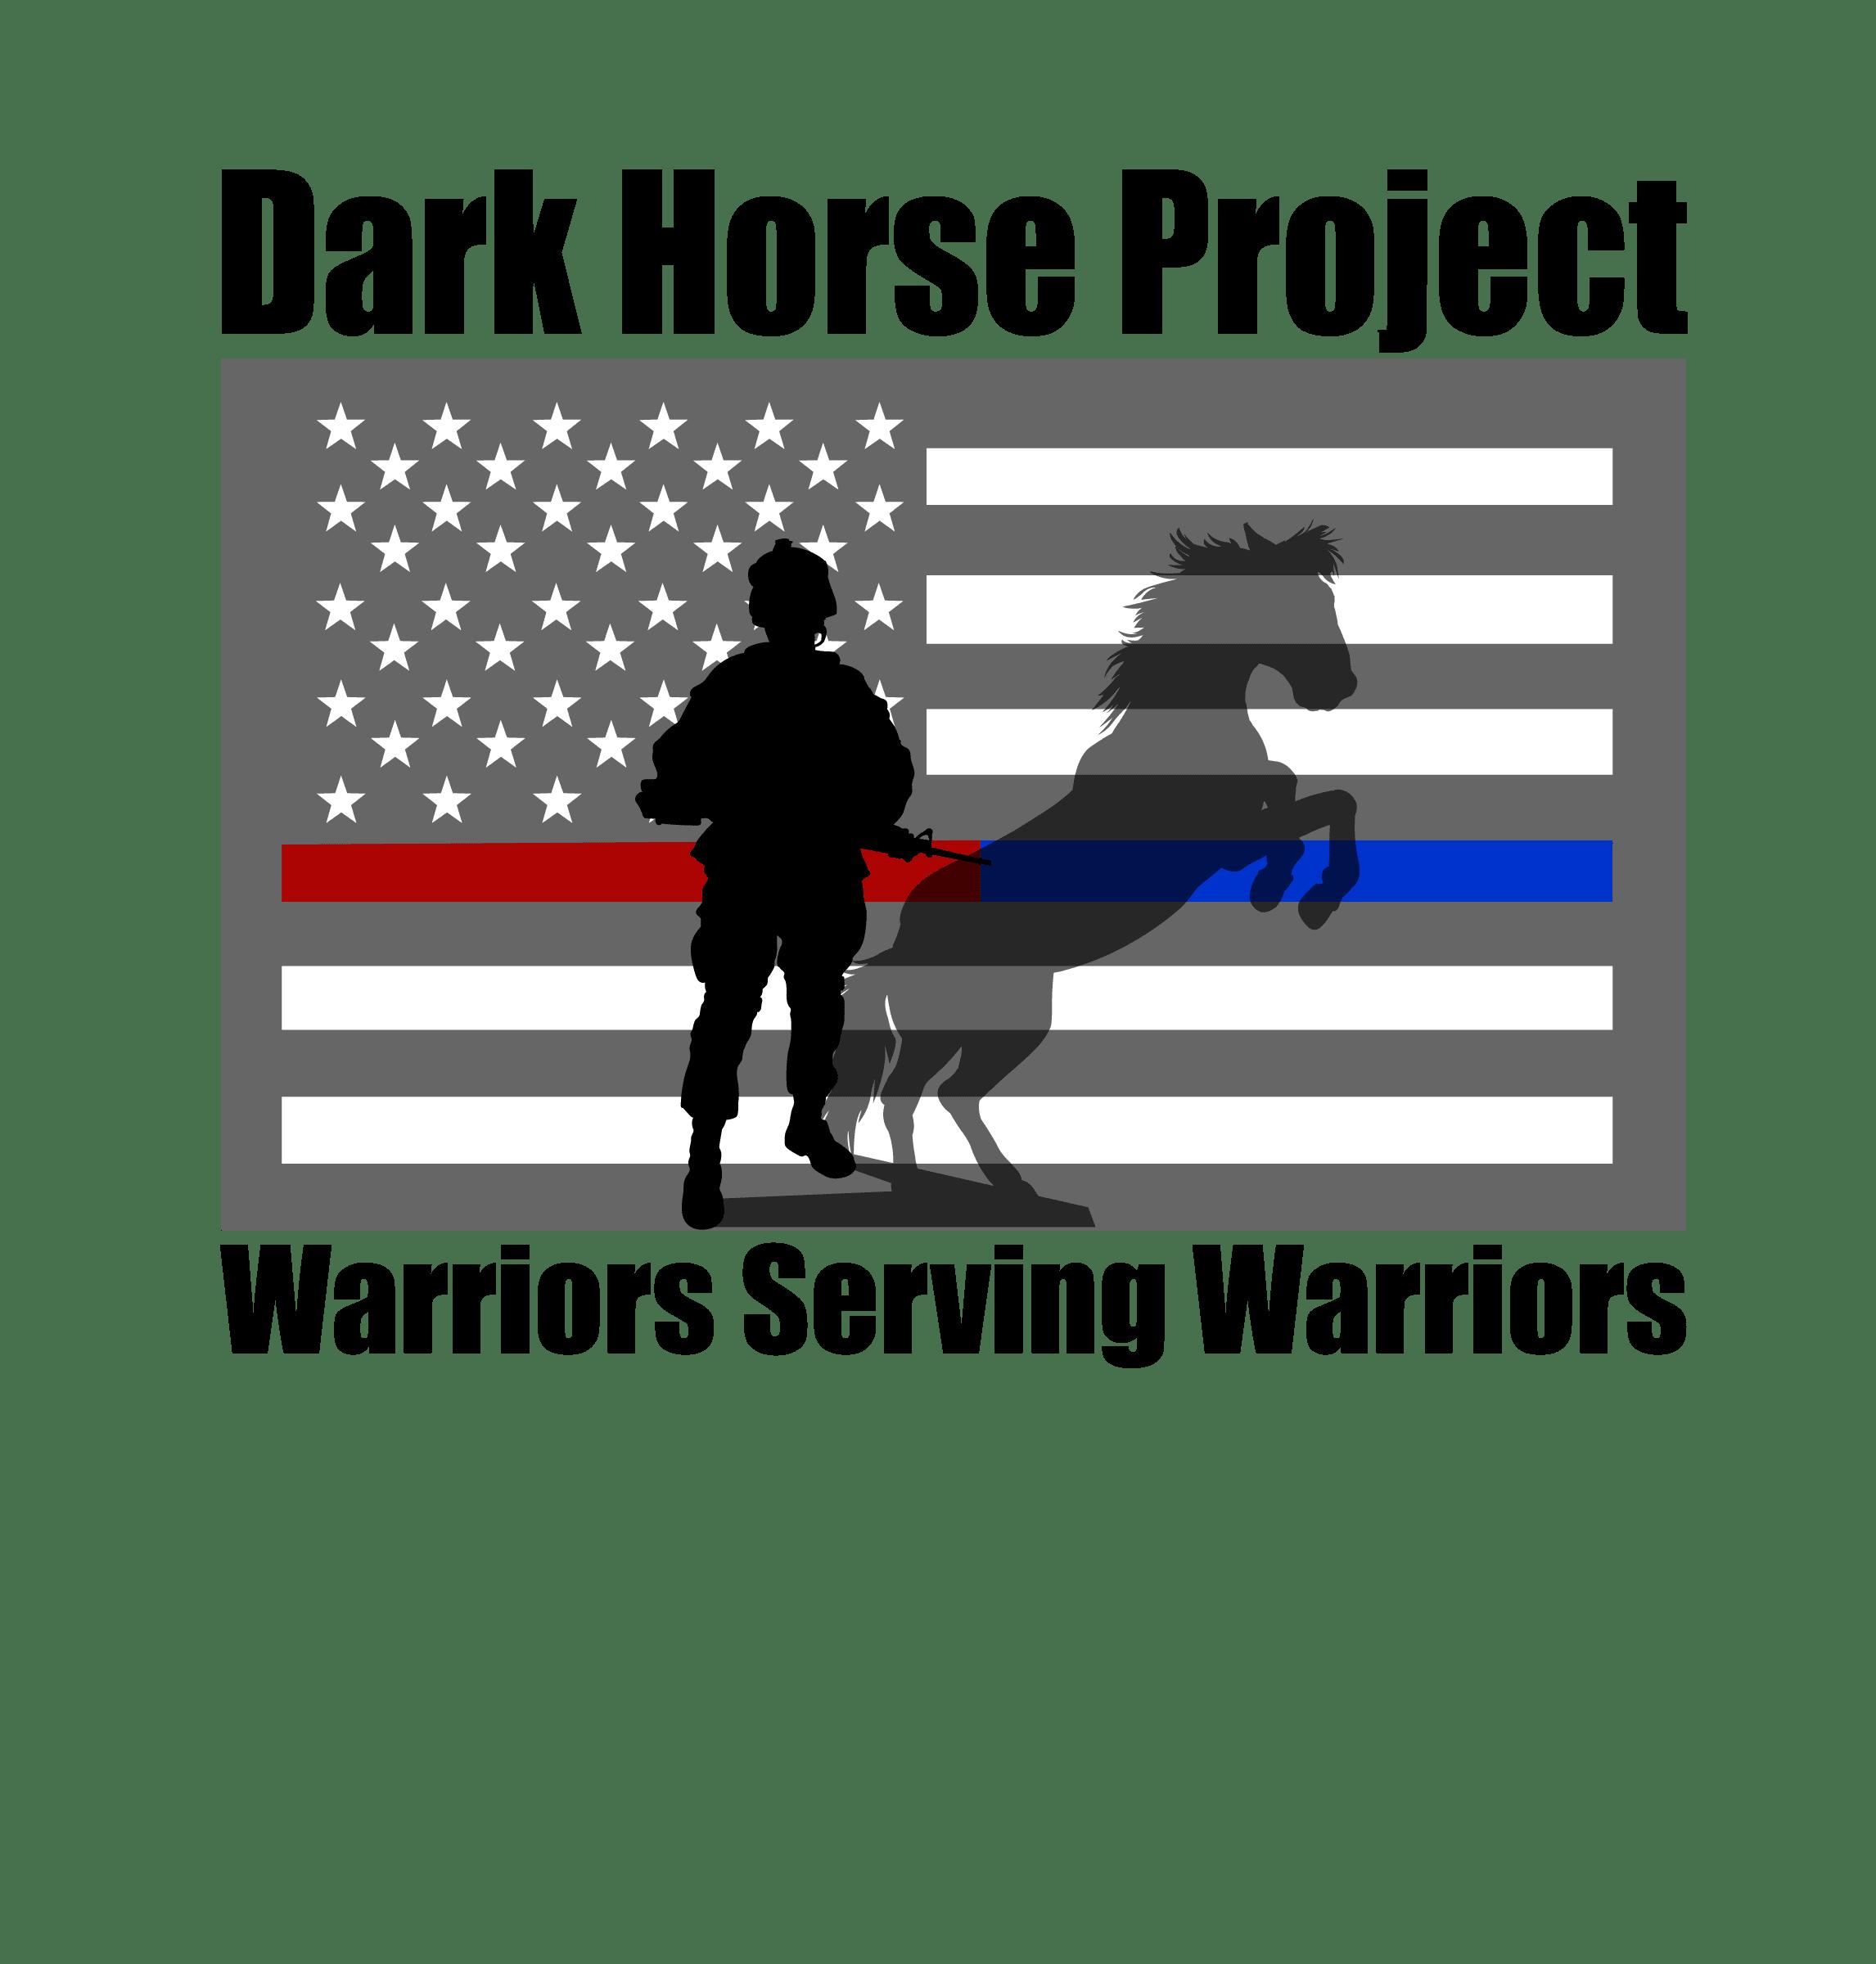 Dark Horse Project